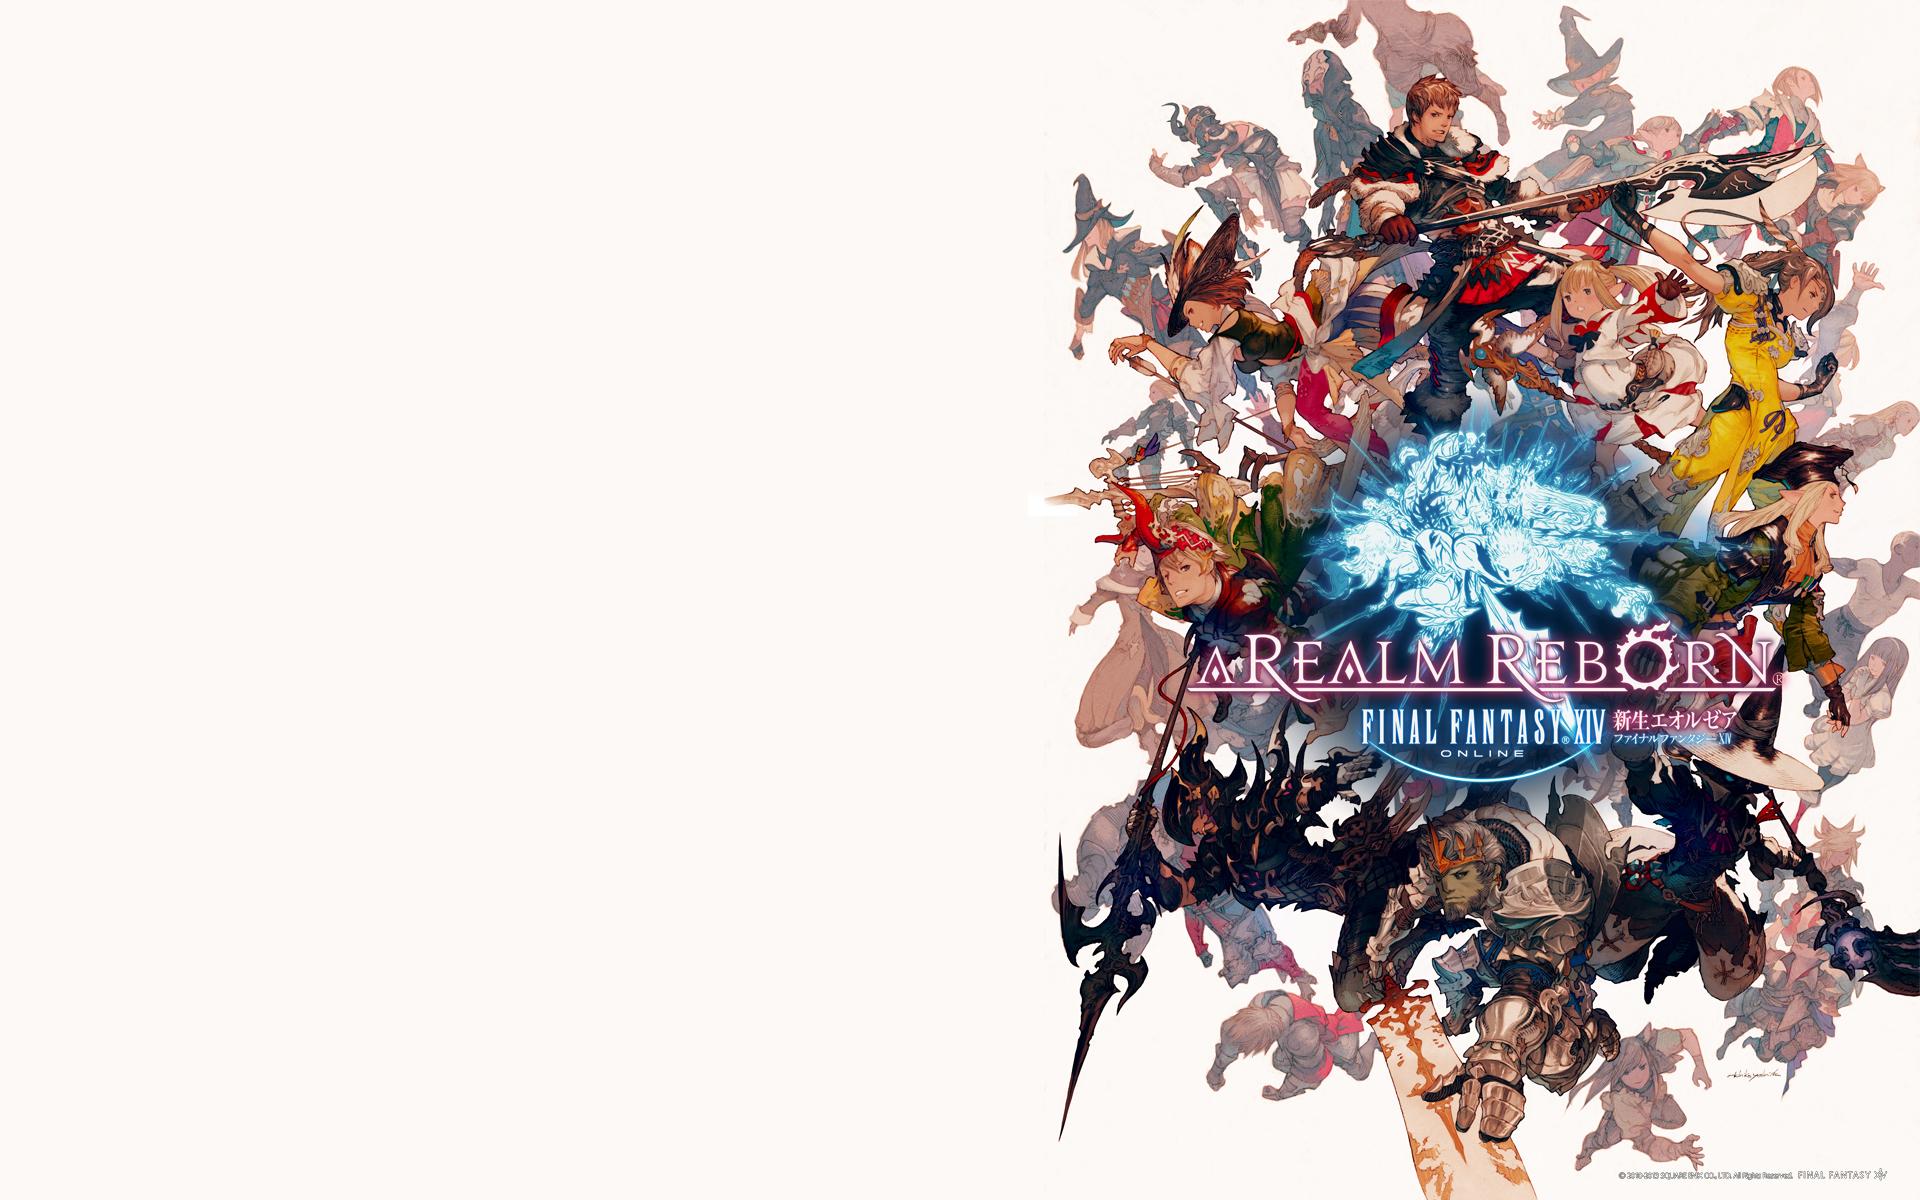 47 Final Fantasy Black Mage Wallpaper On Wallpapersafari